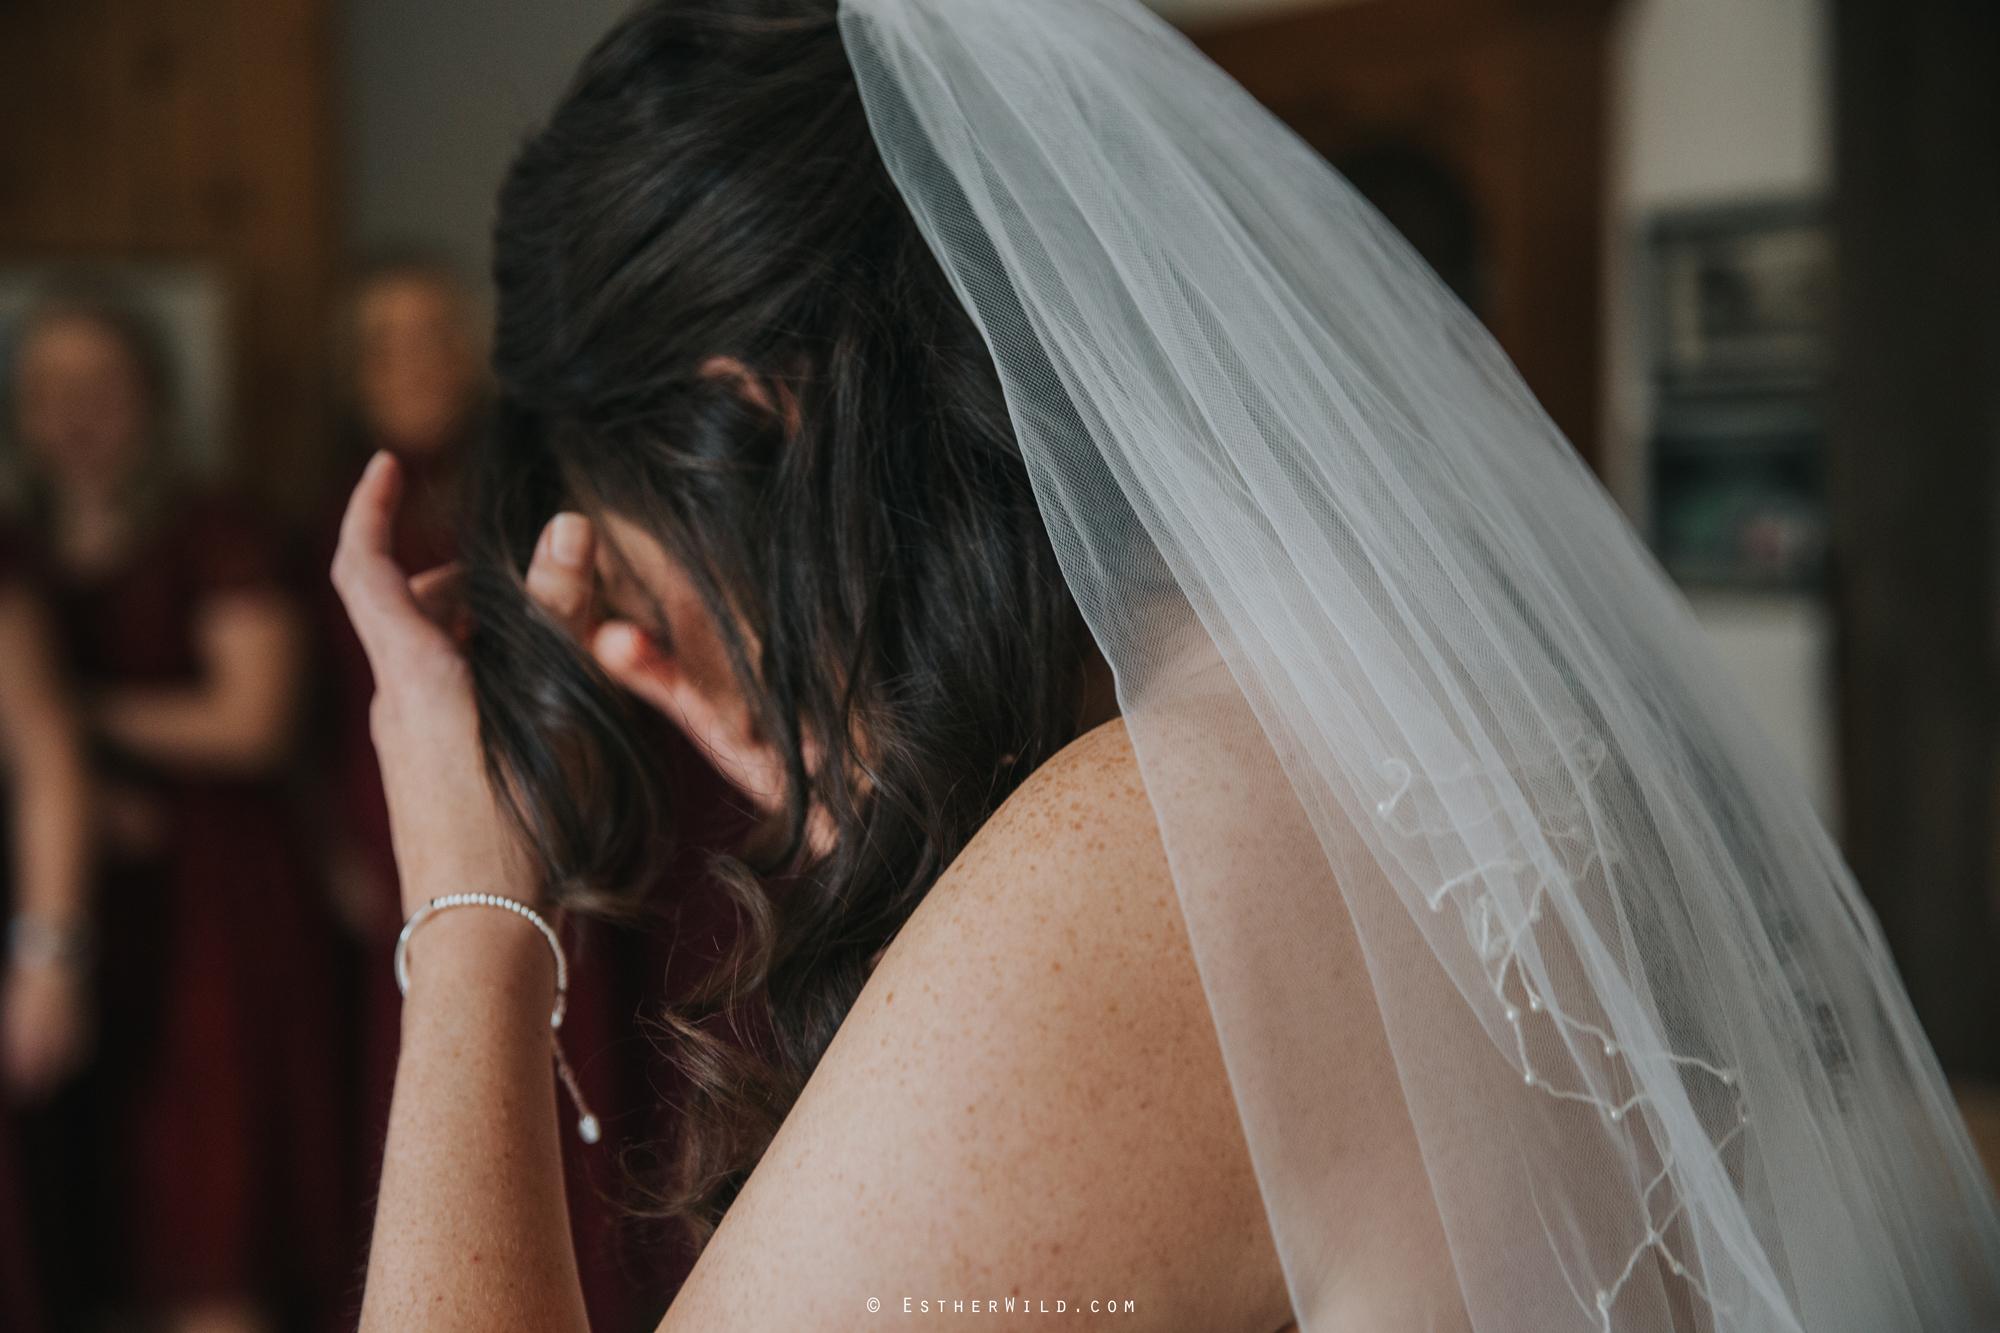 Reading_Room_Weddings_Alby_Norwich_Photographer_Esther_Wild_IMG_0563.jpg